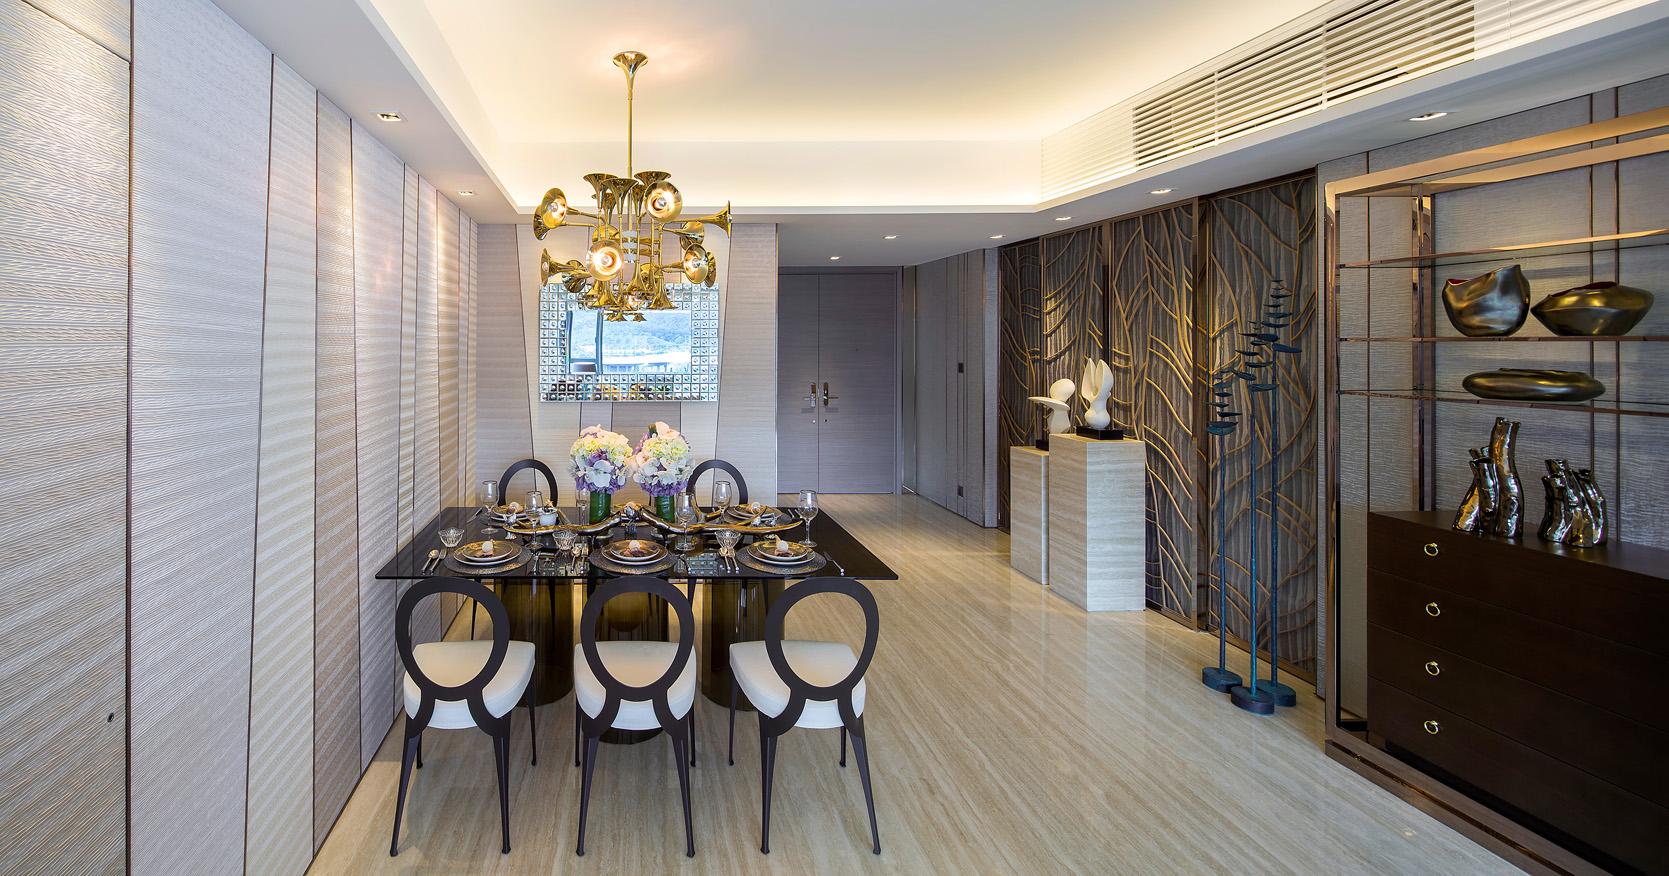 get the look 17 mid century modern glamorous dining room delightfull botti chandelier